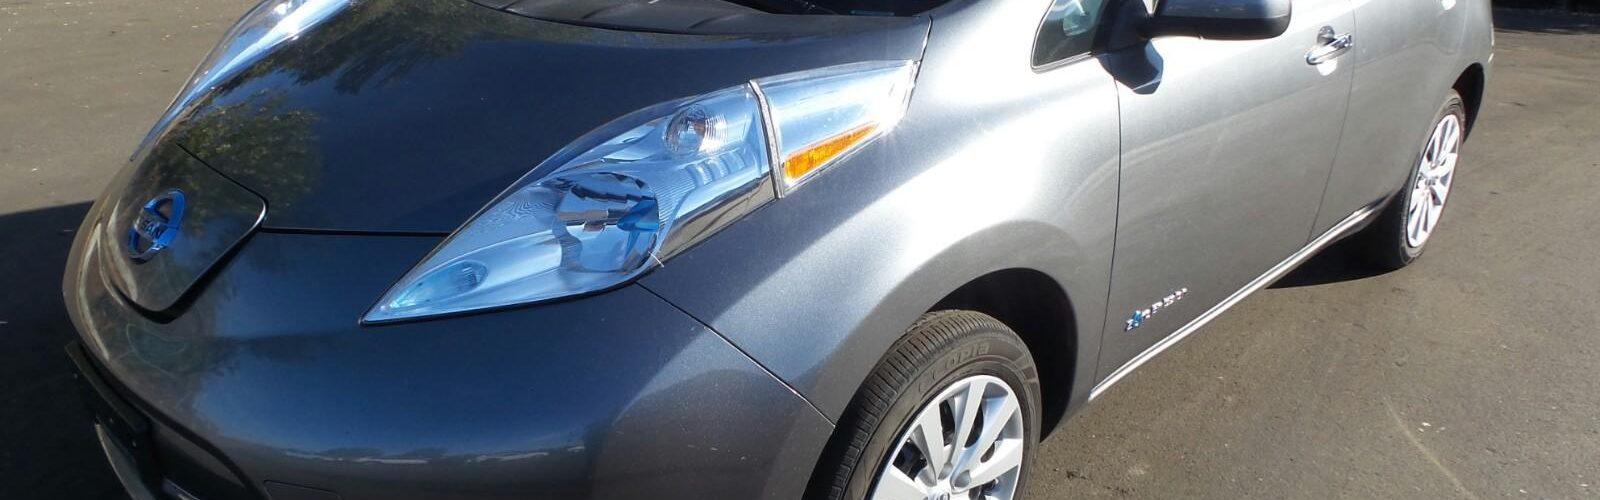 Nissan LEAF S 2014 – 40 449 km –  17 400 $ – VENDU!